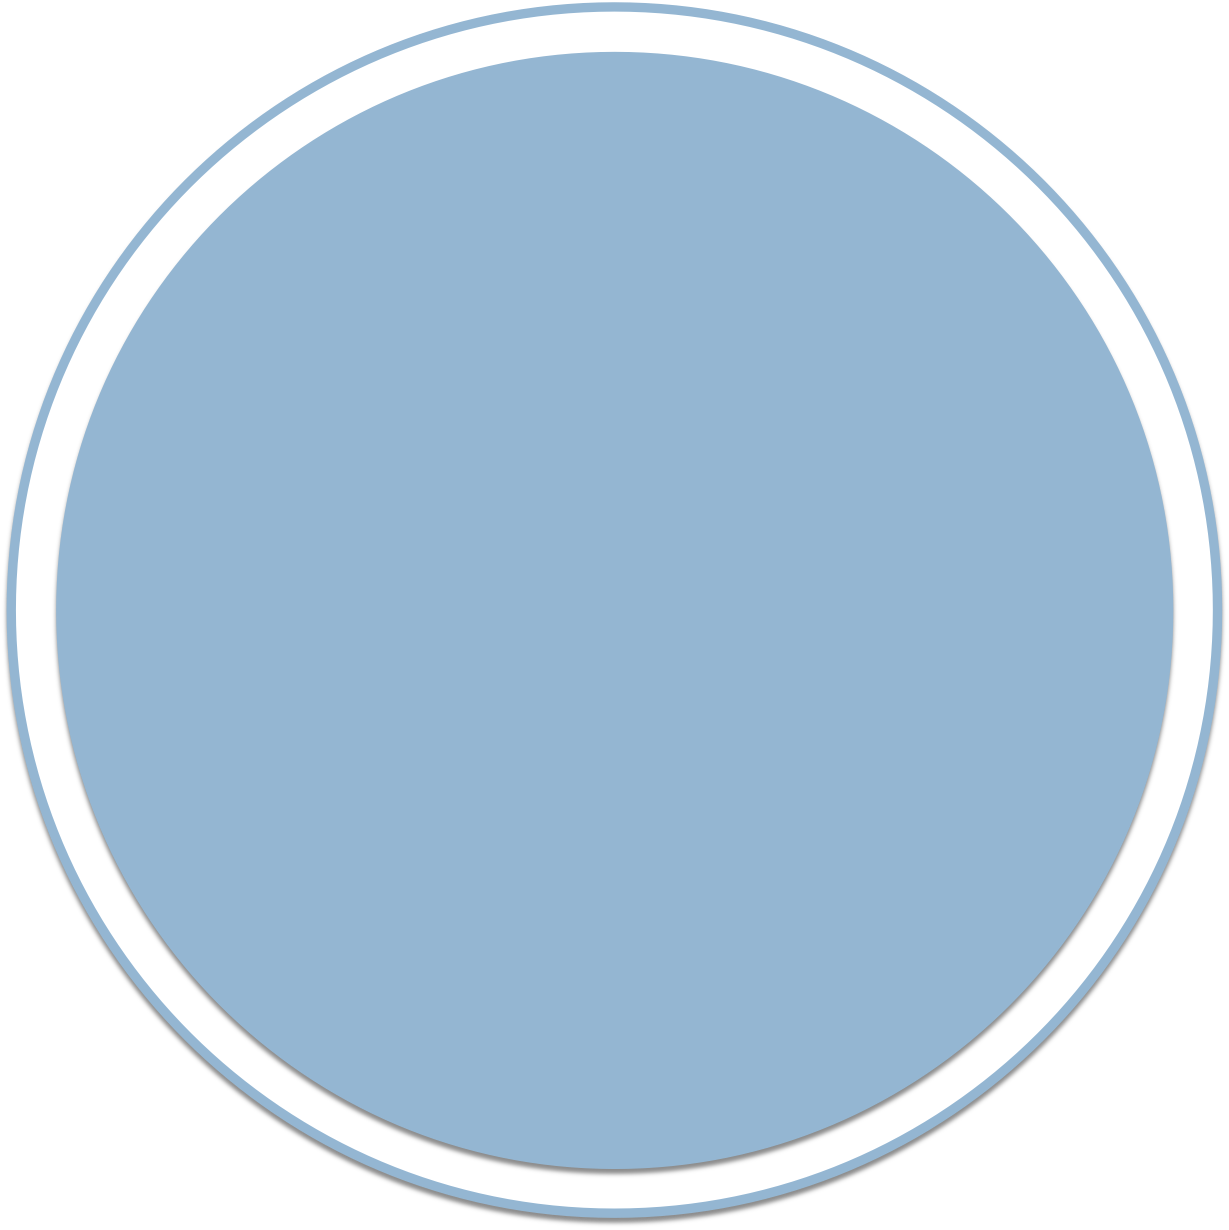 1229x1230 Edi Blue Circle Citizen Science Central